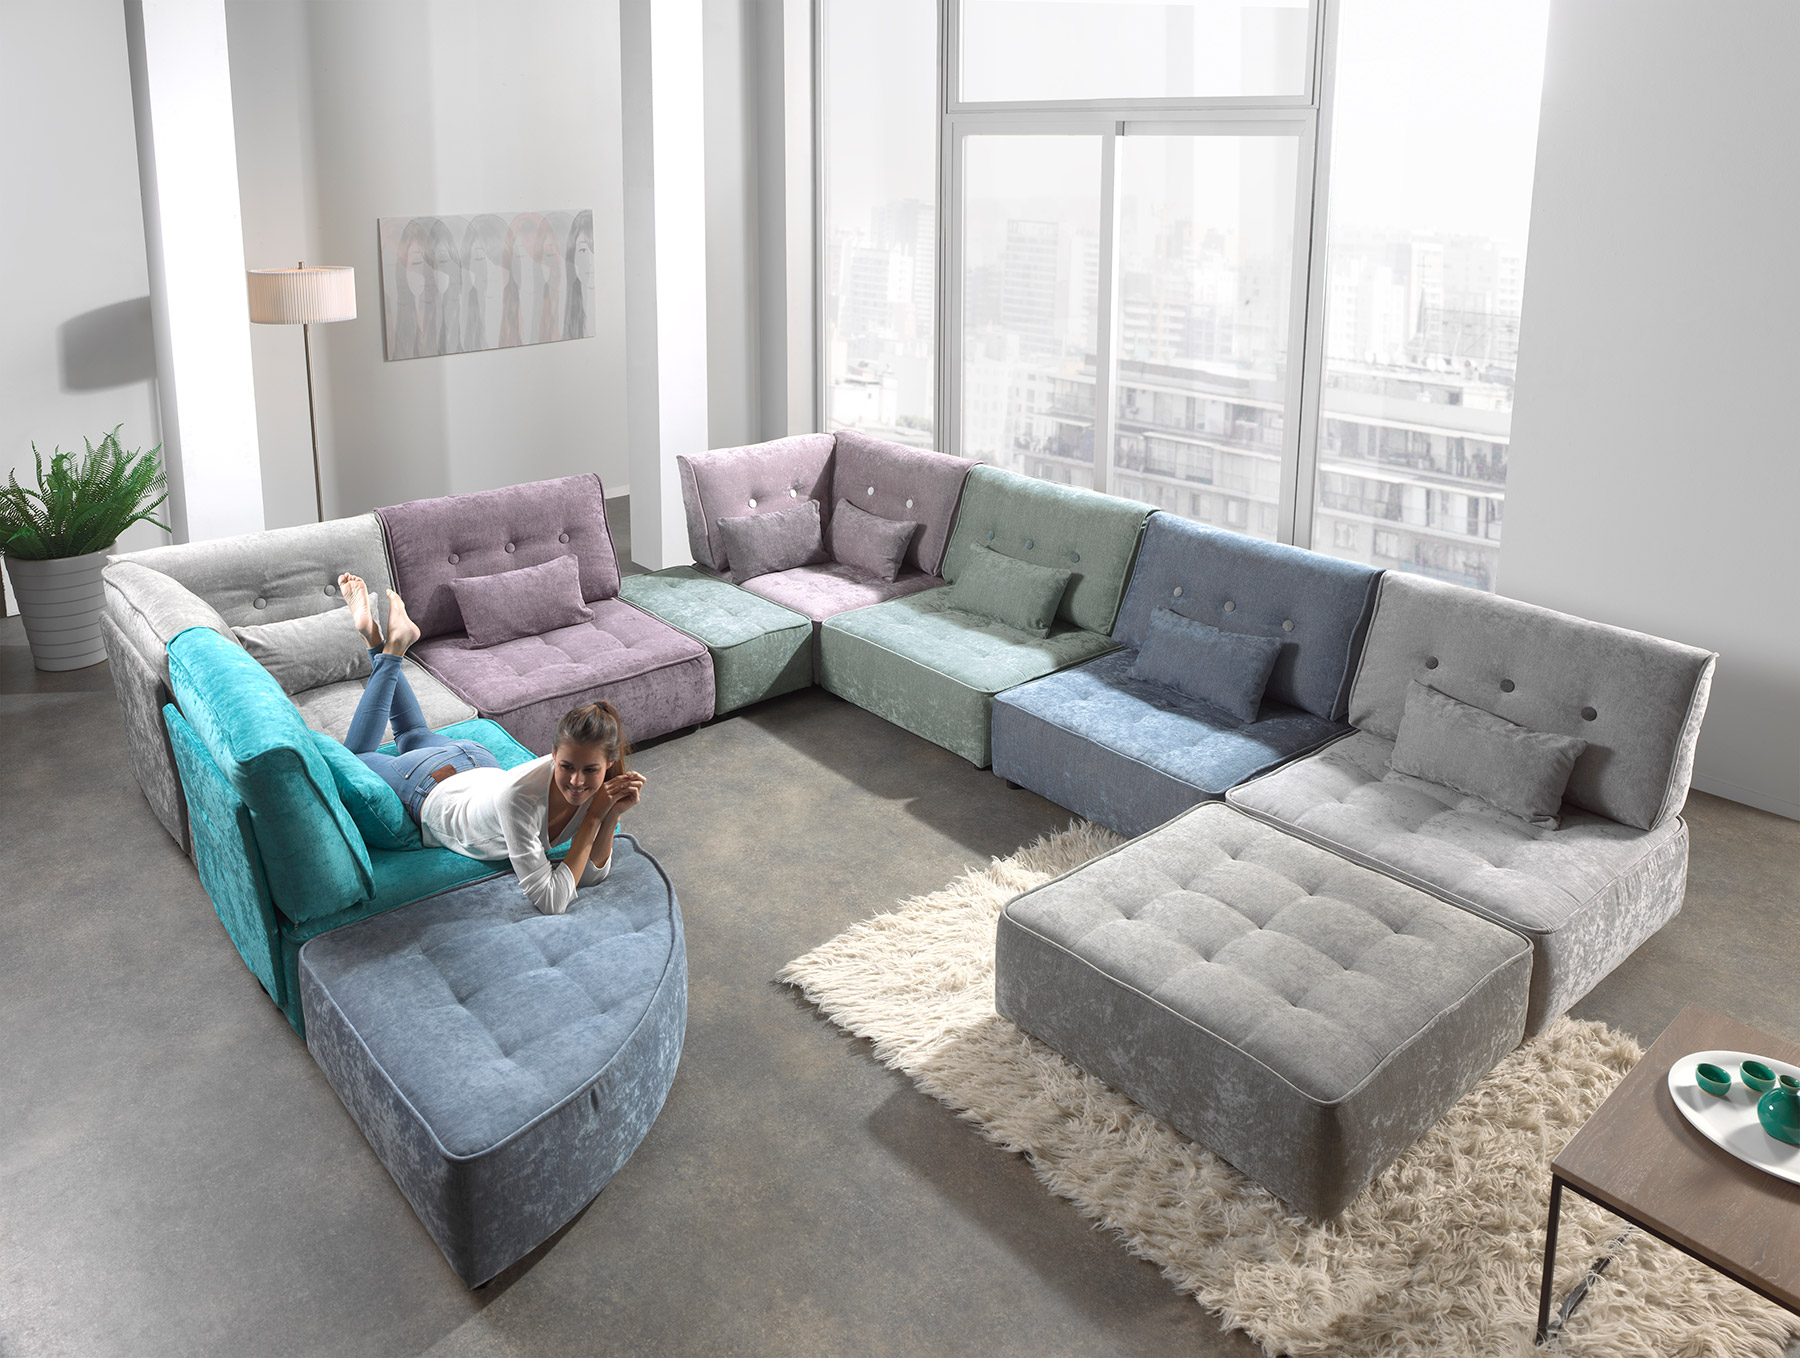 meubles bourg en bresse best appartement with meubles bourg en bresse free meubles mailland. Black Bedroom Furniture Sets. Home Design Ideas